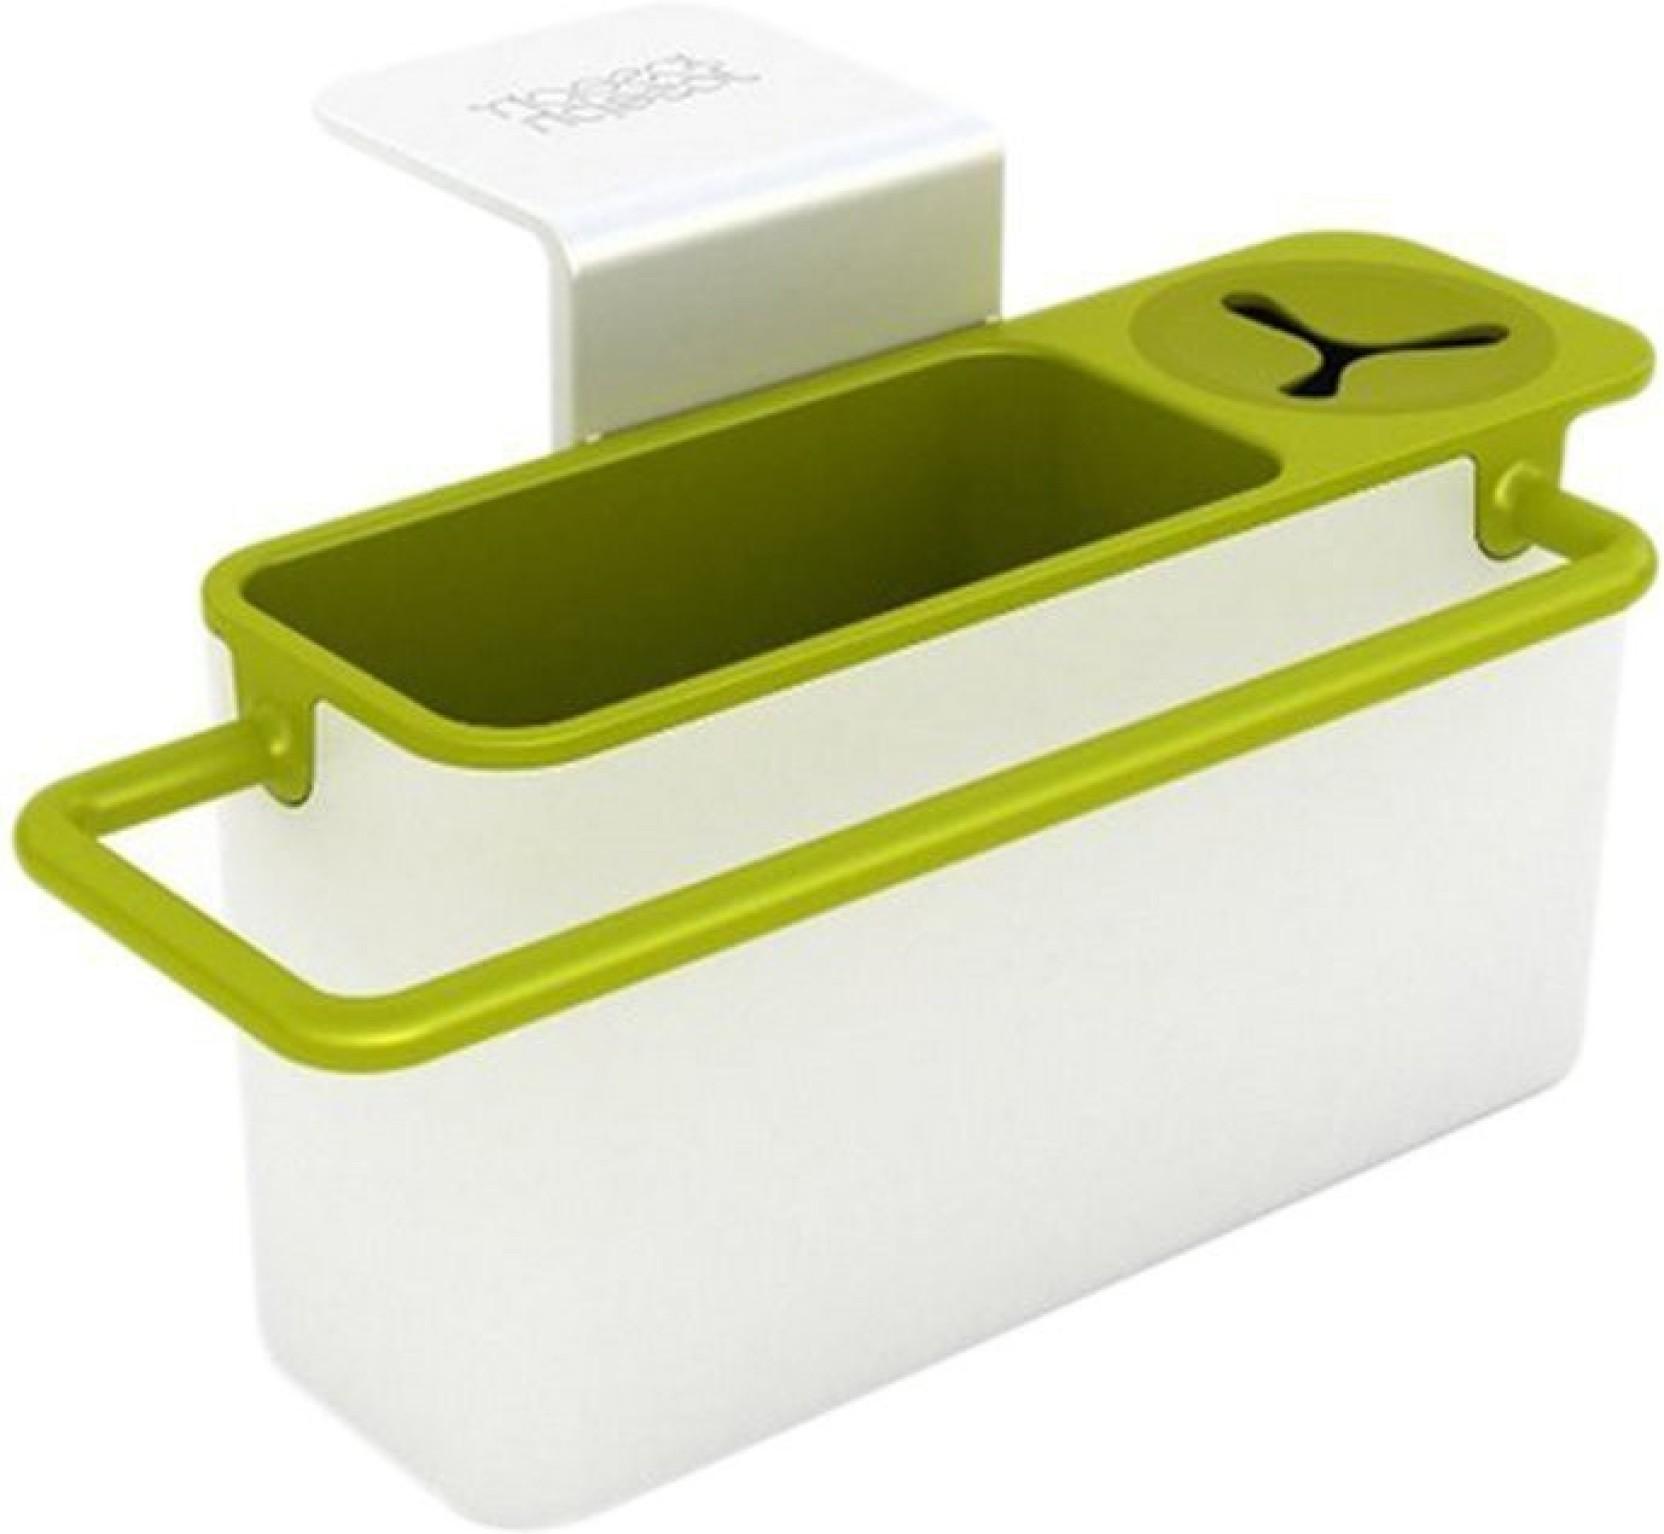 Washing Tools Holder Kitchen Sink Sponge Brush Organizer Rust Proof Durable